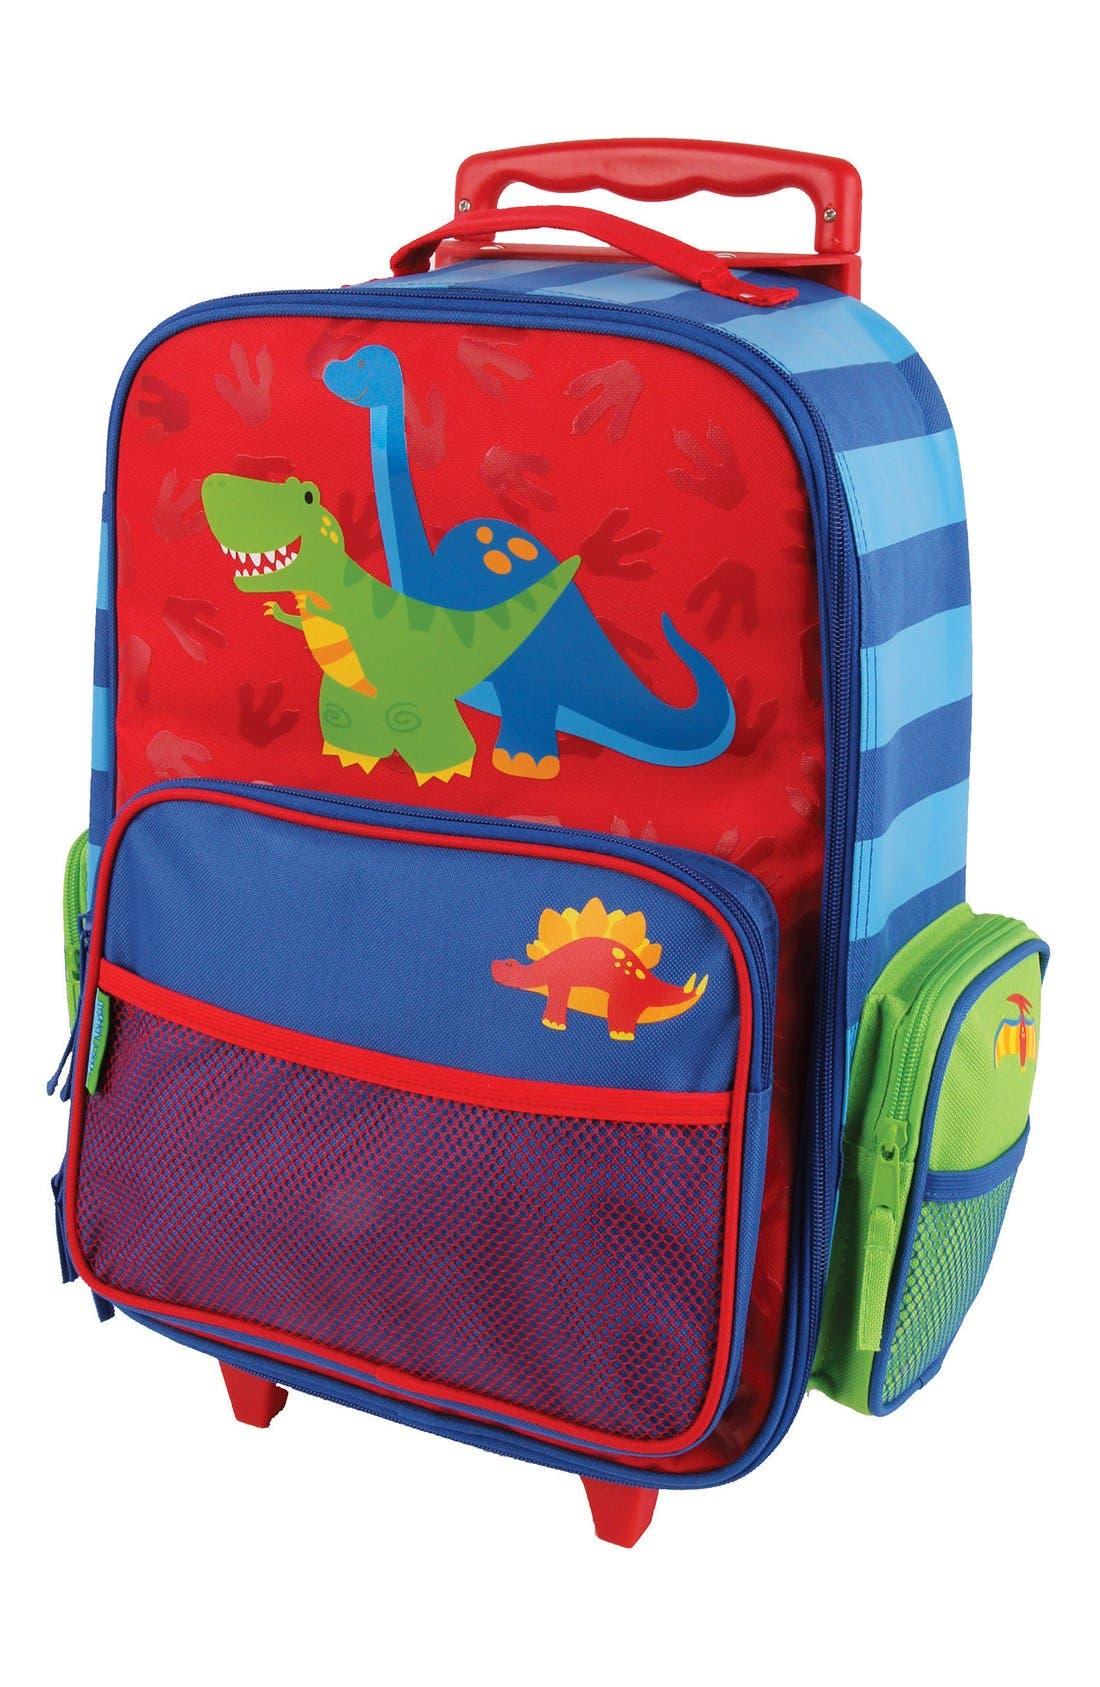 Alternate Image 1 Selected - Stephen Joseph Rolling Suitcase (Kids)